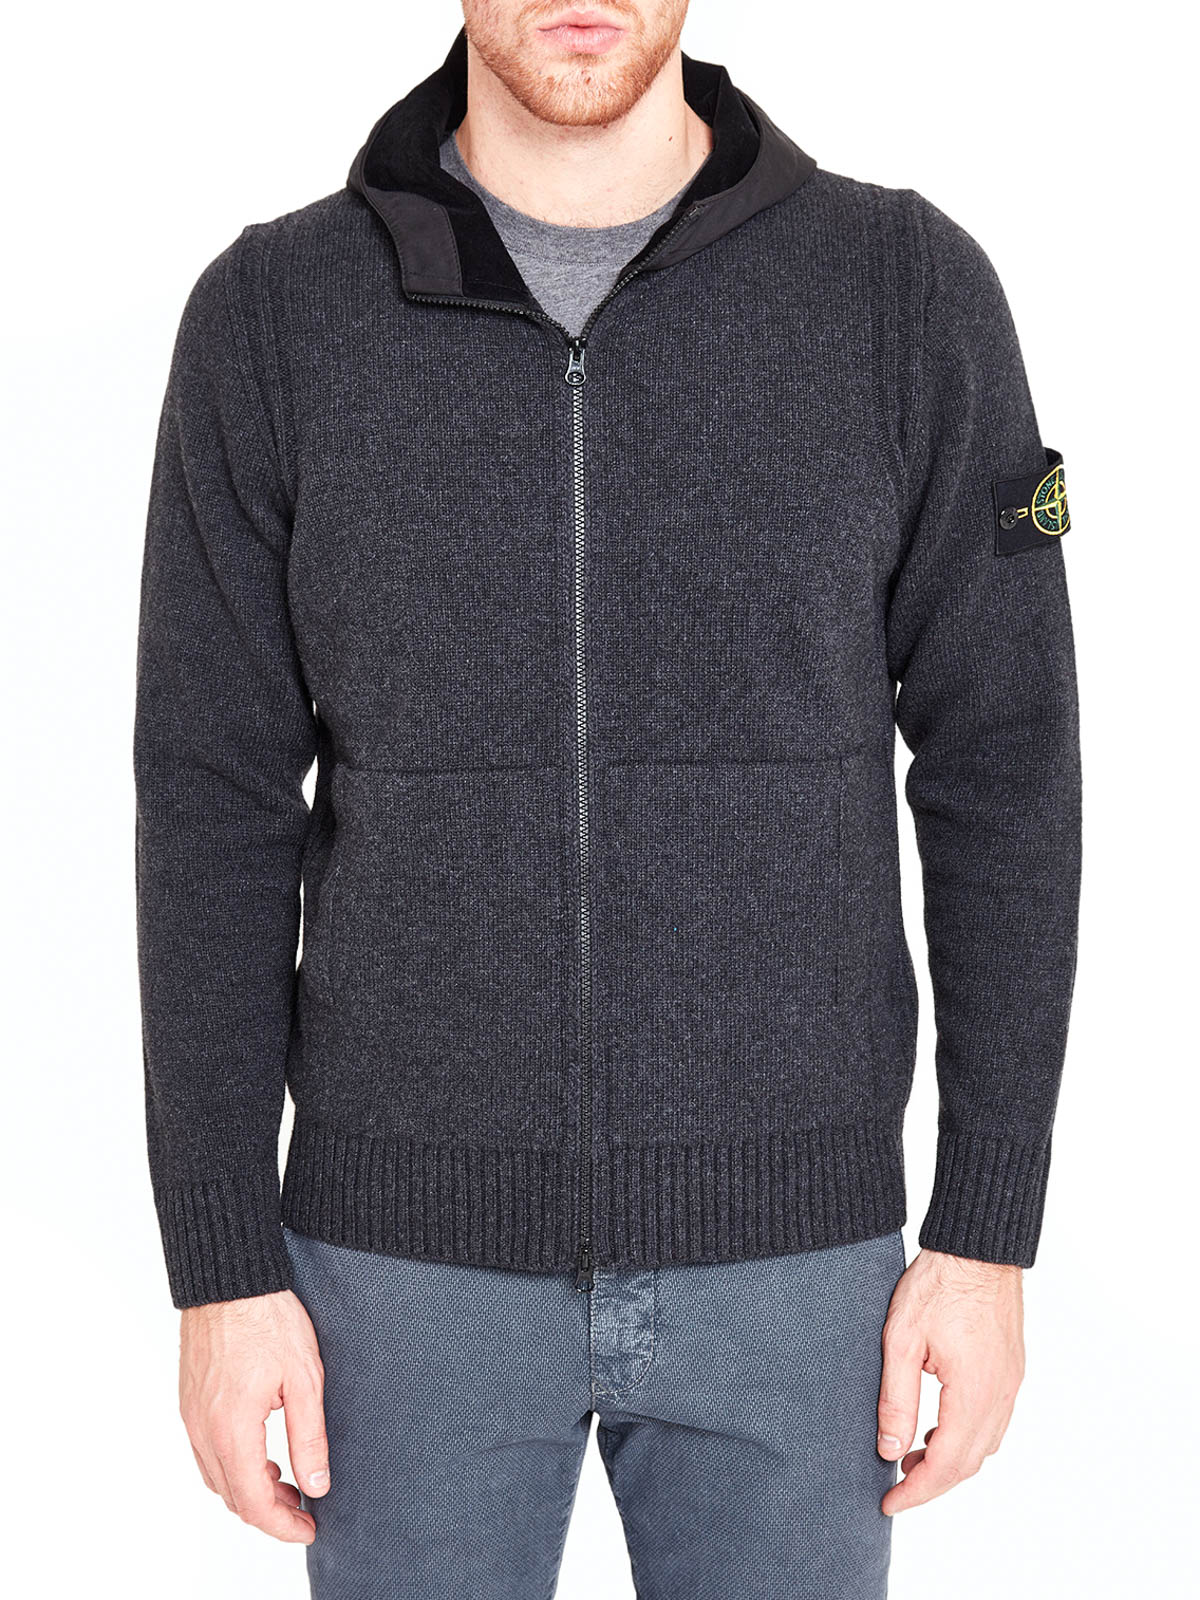 Hooded wool cardigan by Stone Island - cardigans | iKRIX